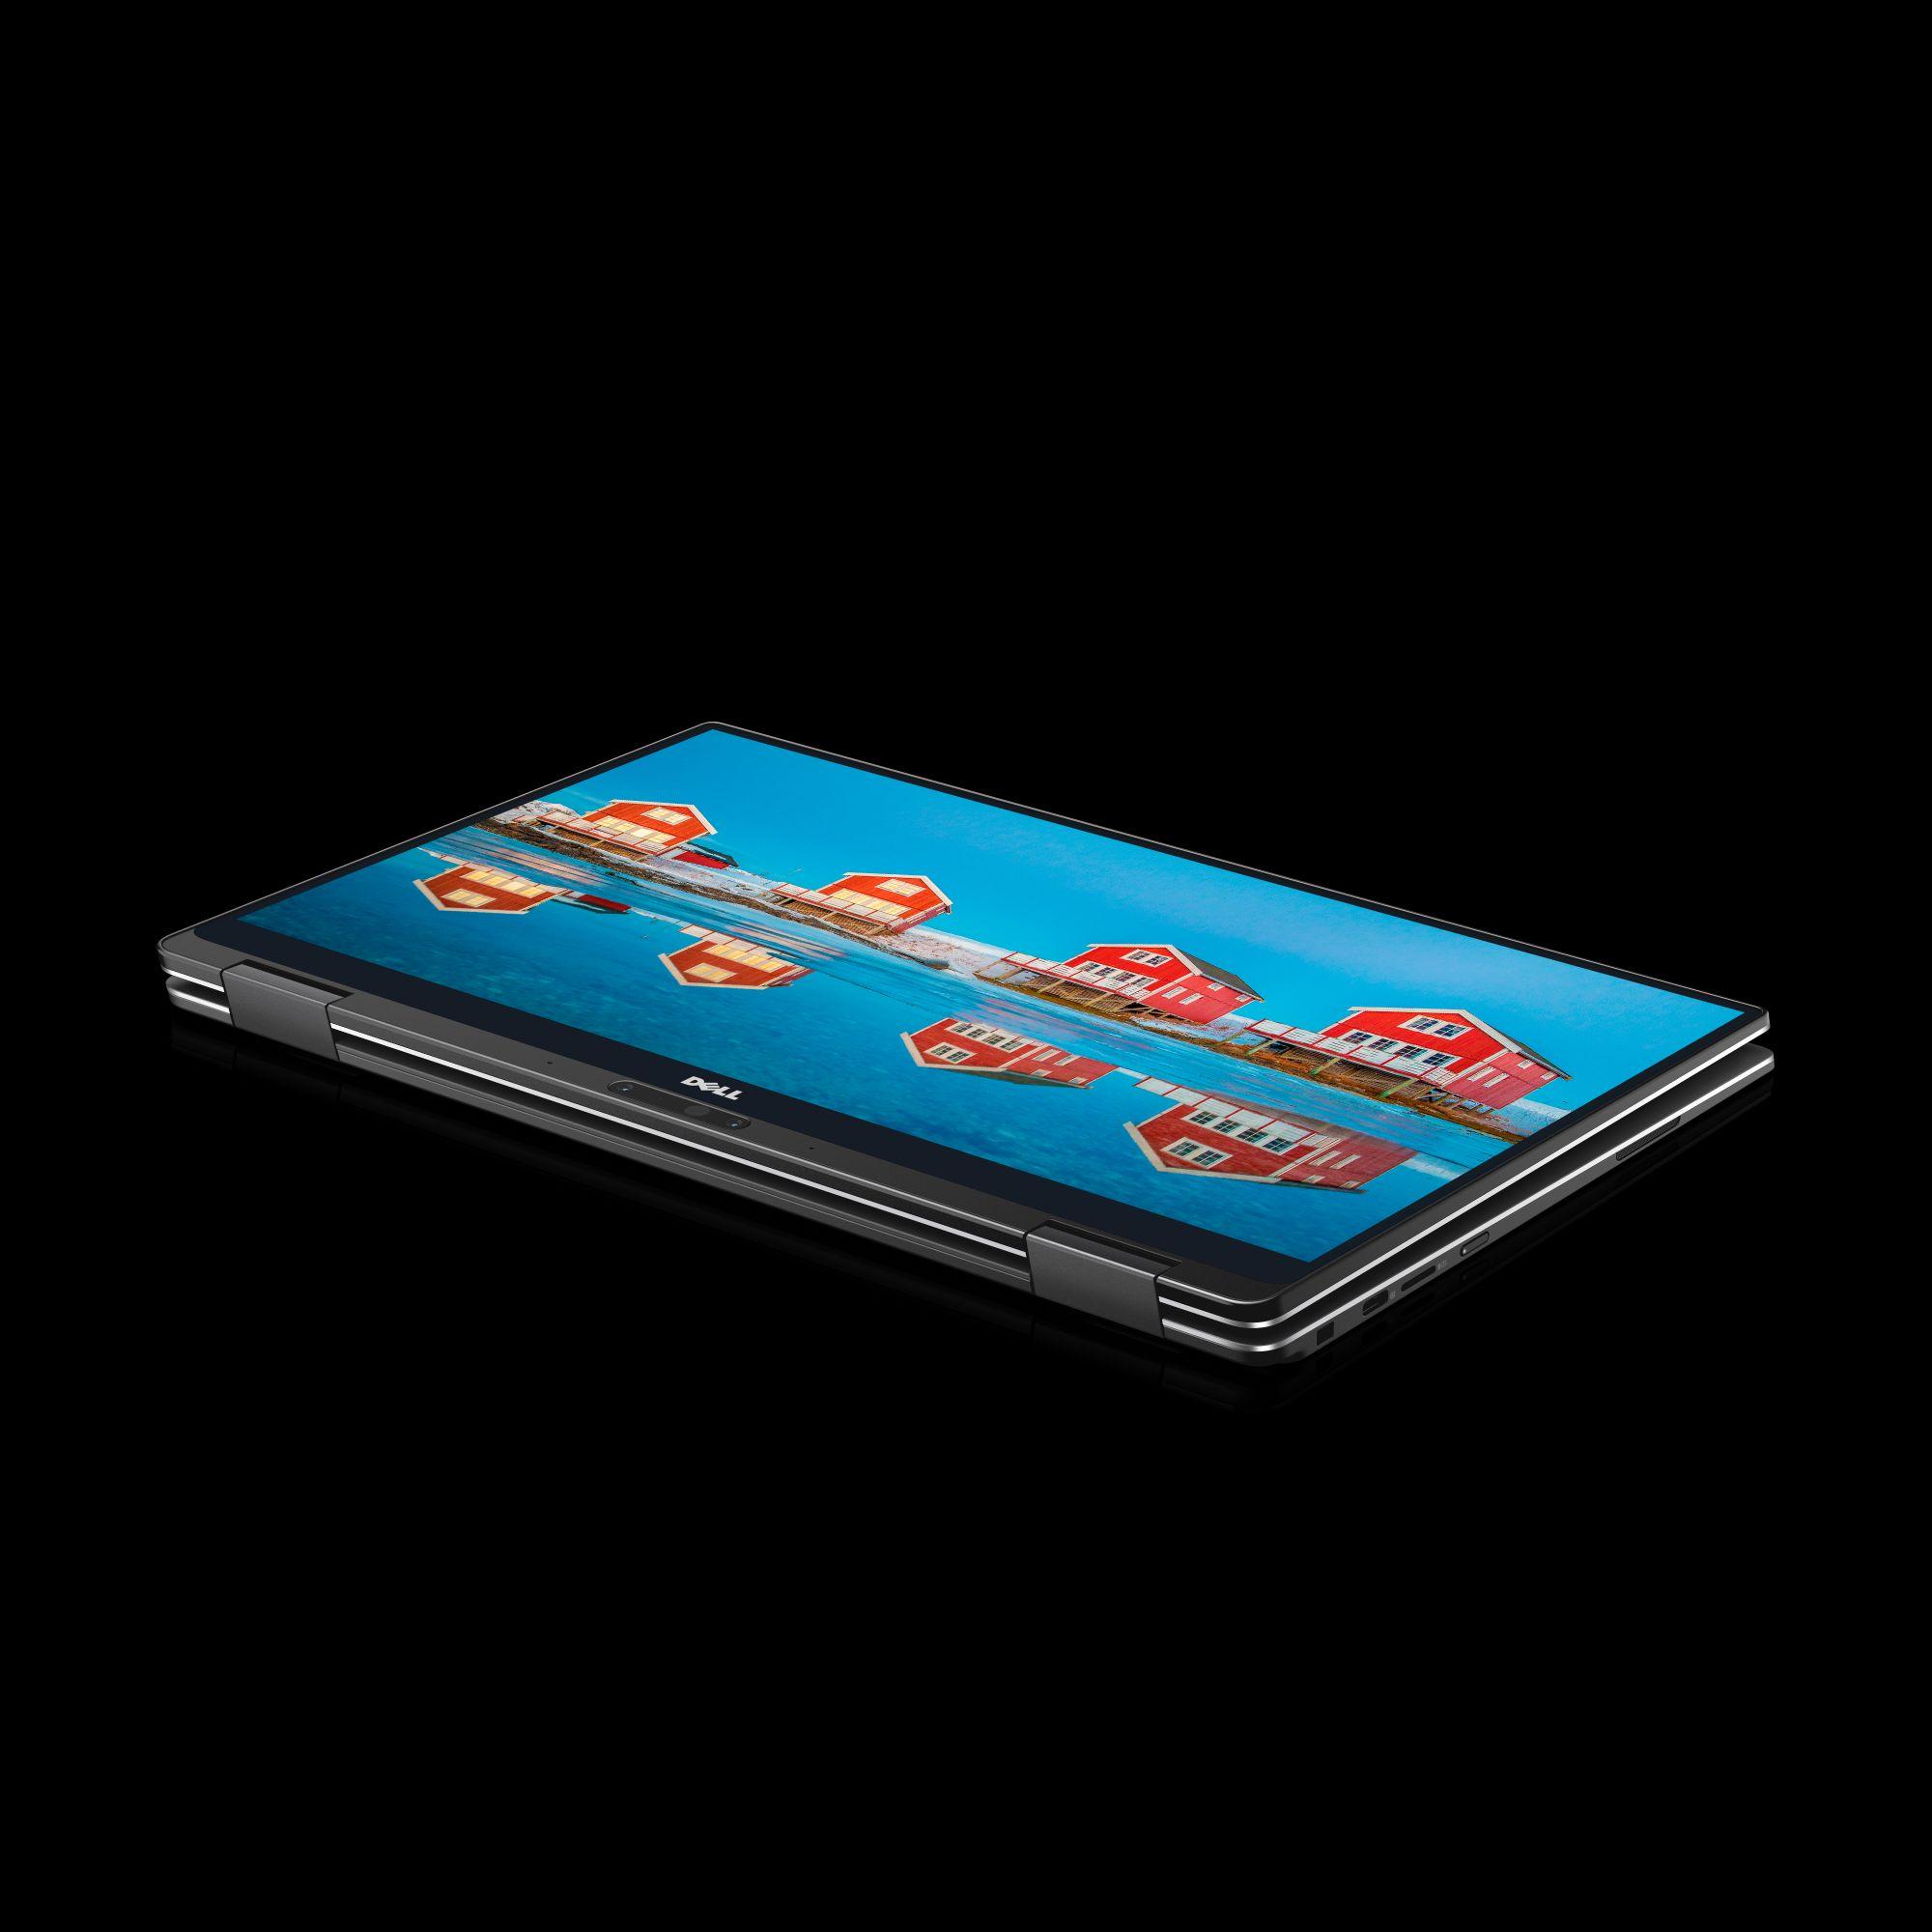 Ноутбук Dell XPS 15 9560-8968 (Intel Core i7-7700HQ 2.8 GHz/16384Mb/512Gb SSD/nVidia GeForce GTX 1050 4096Mb/Wi-Fi/Bluetooth/Cam/15.6/3840x2160/Touchscreen/Windows 10 64-bit)